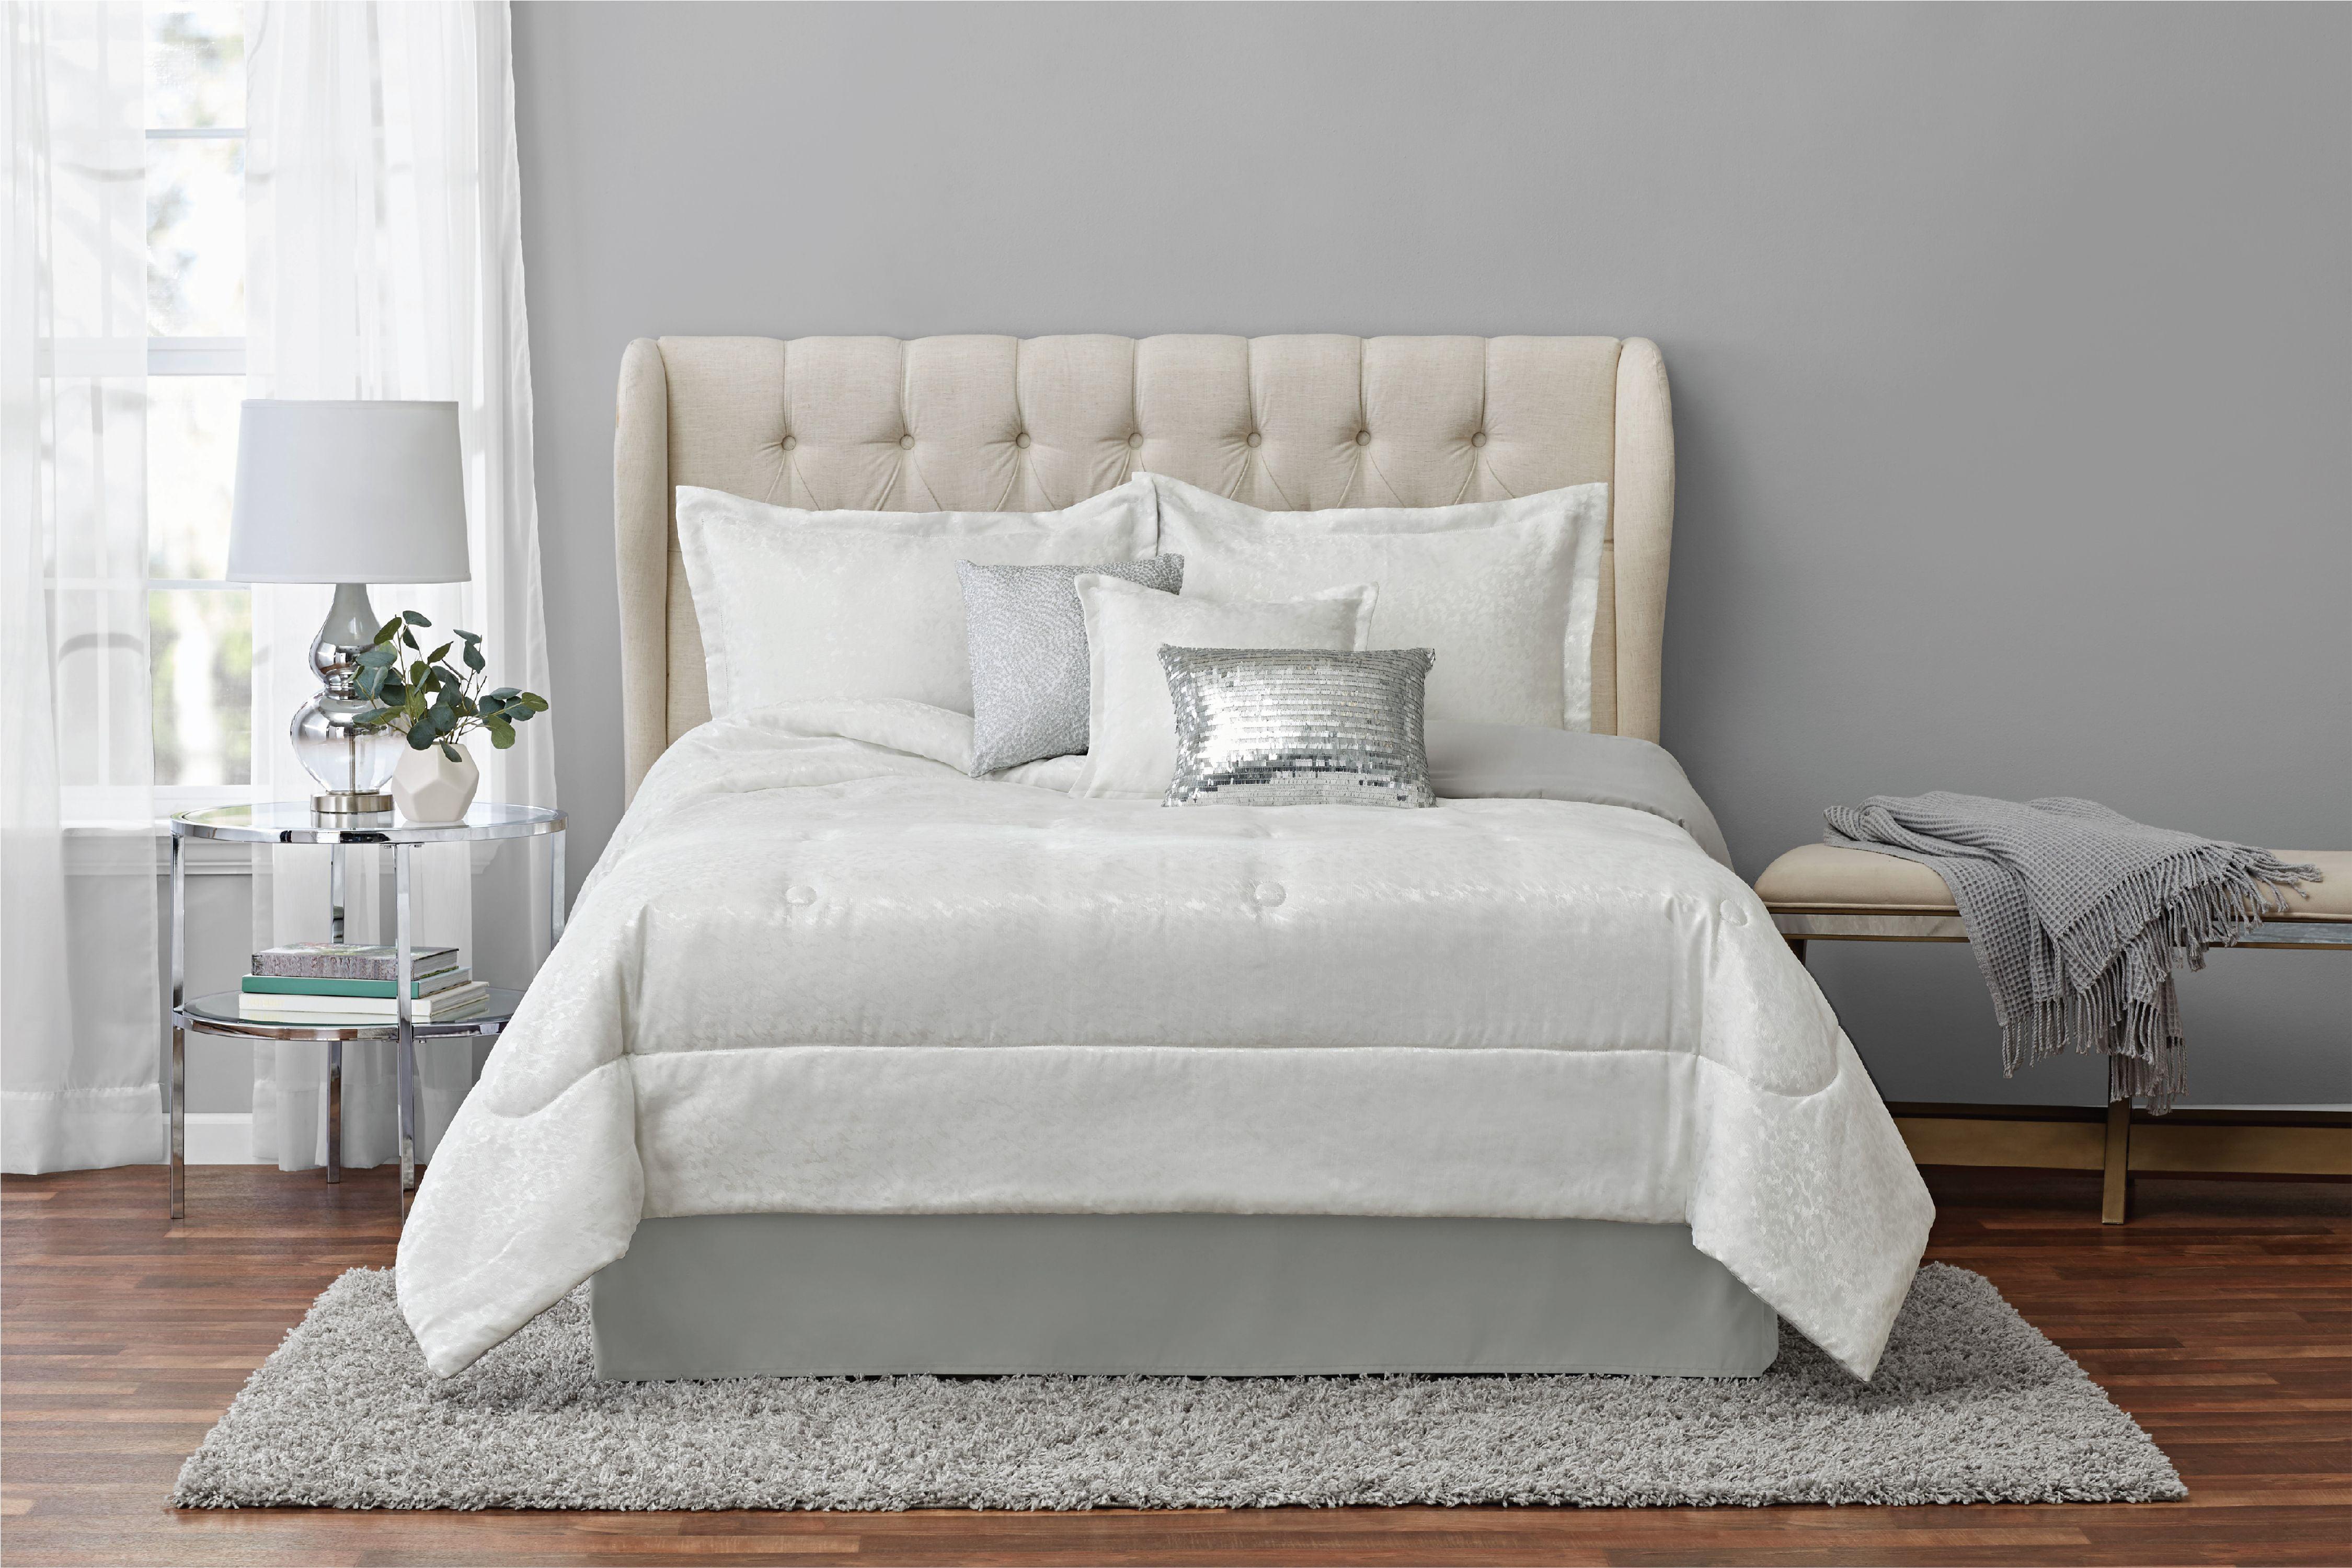 Mainstays Felix Soft Woven Jacquard 7 Piece Comforter Set King